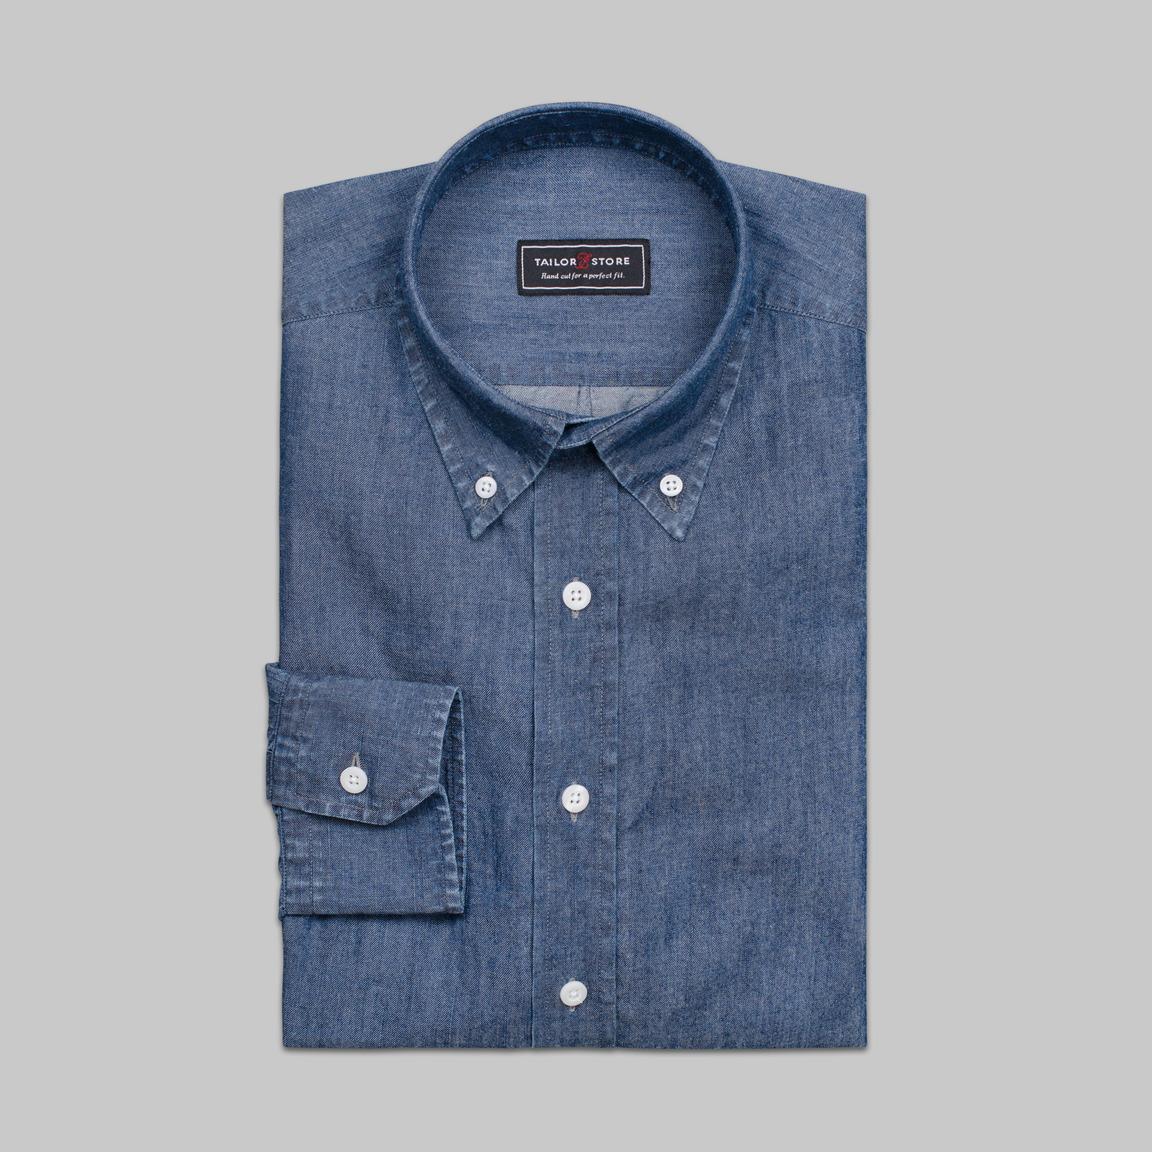 Dark blue denim dress shirt with button down-collar